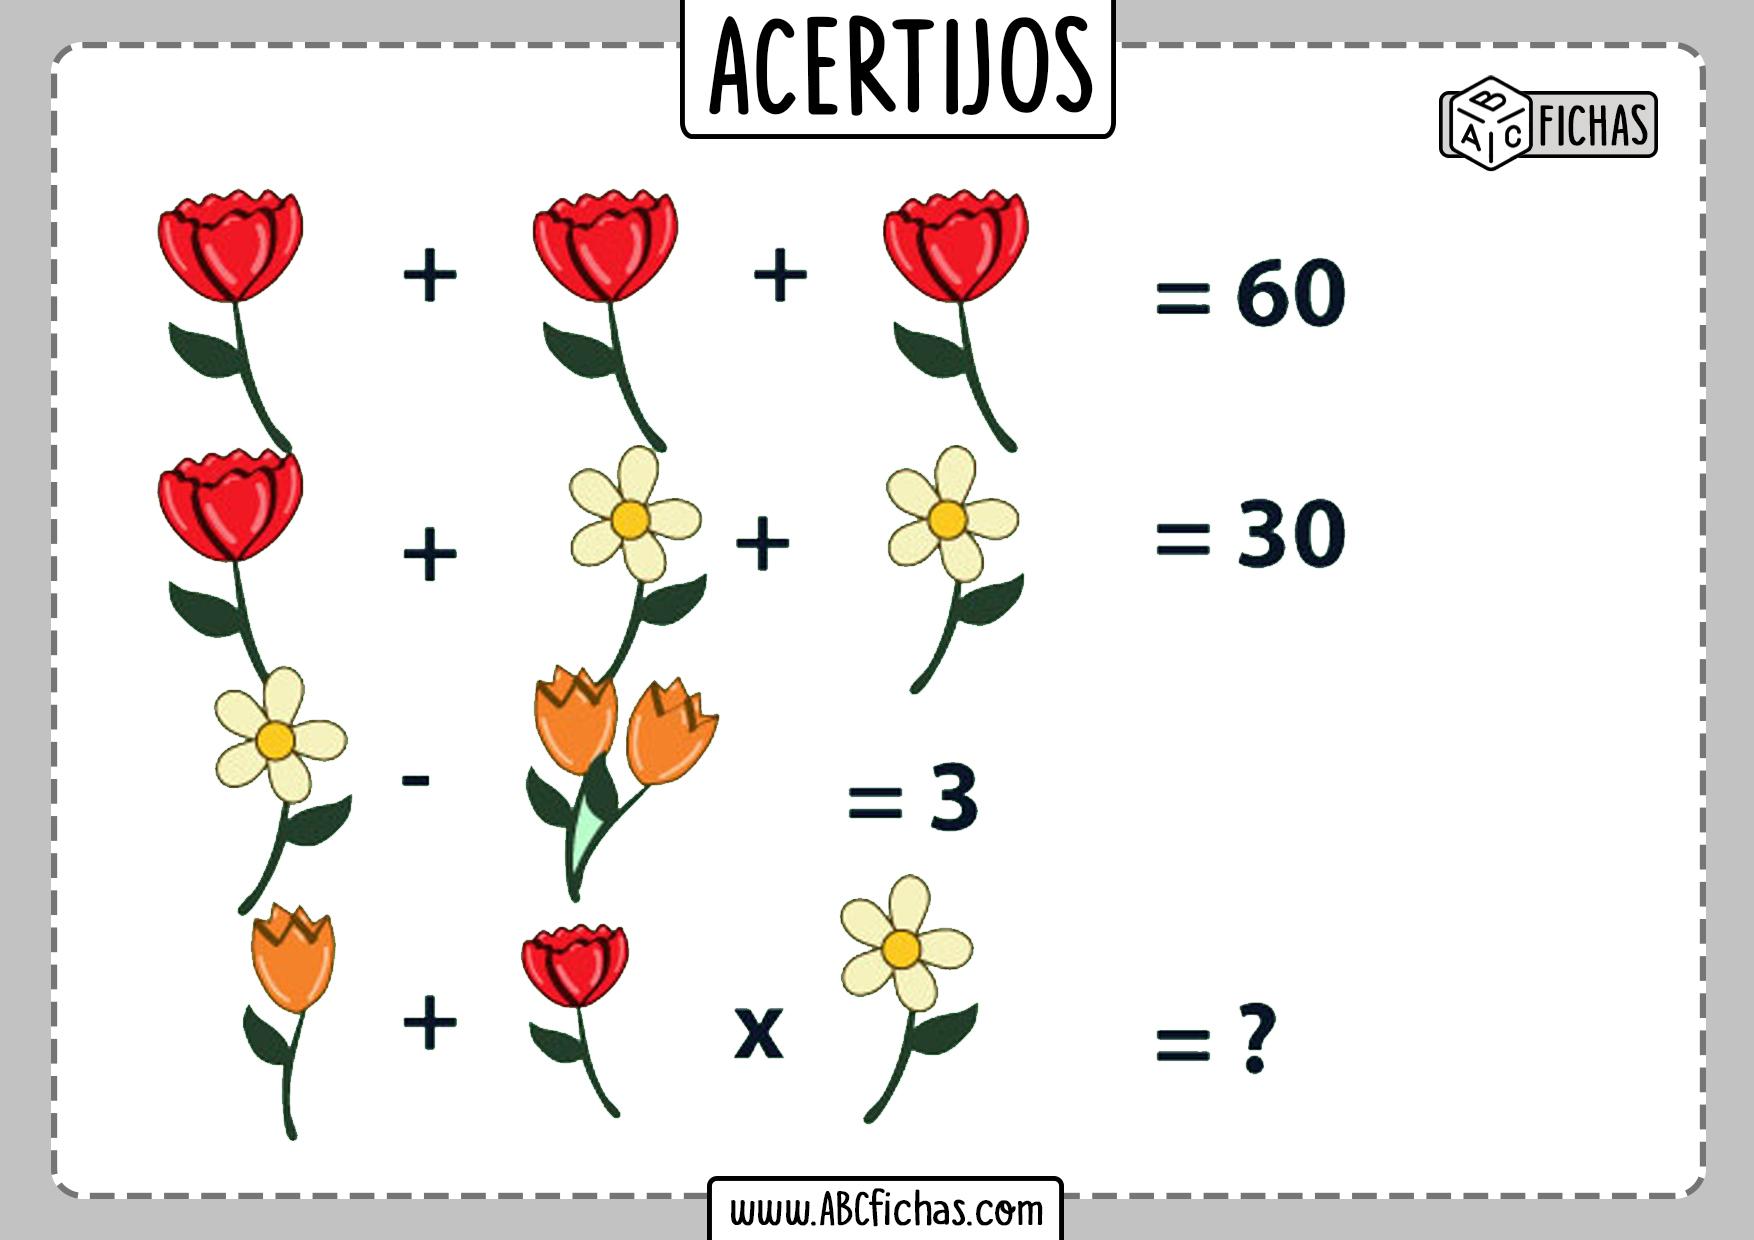 Acertijos numericos faciles